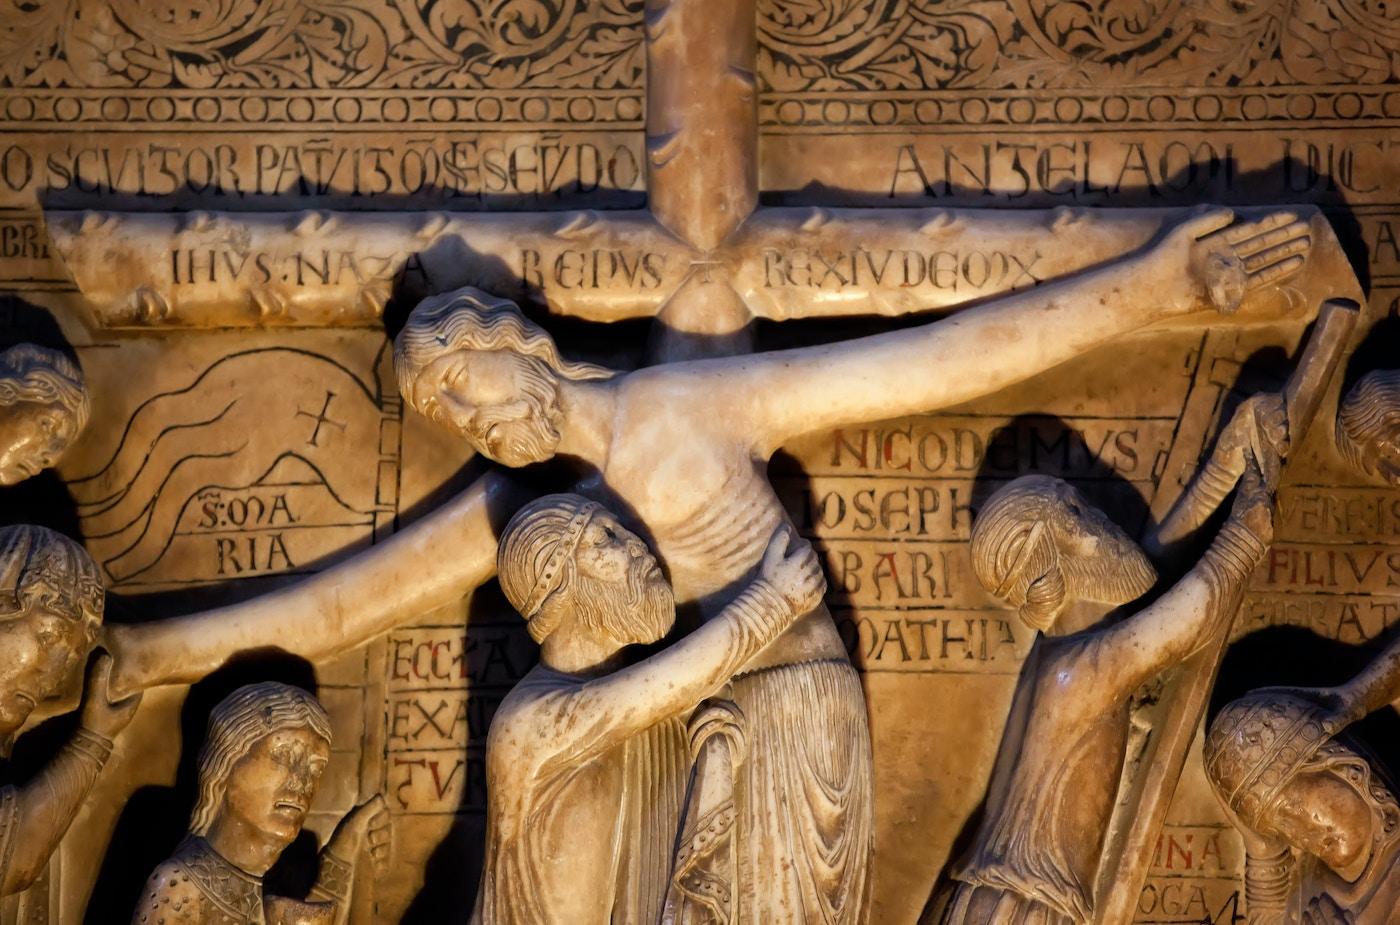 Deposition of Christ (1178): Detail